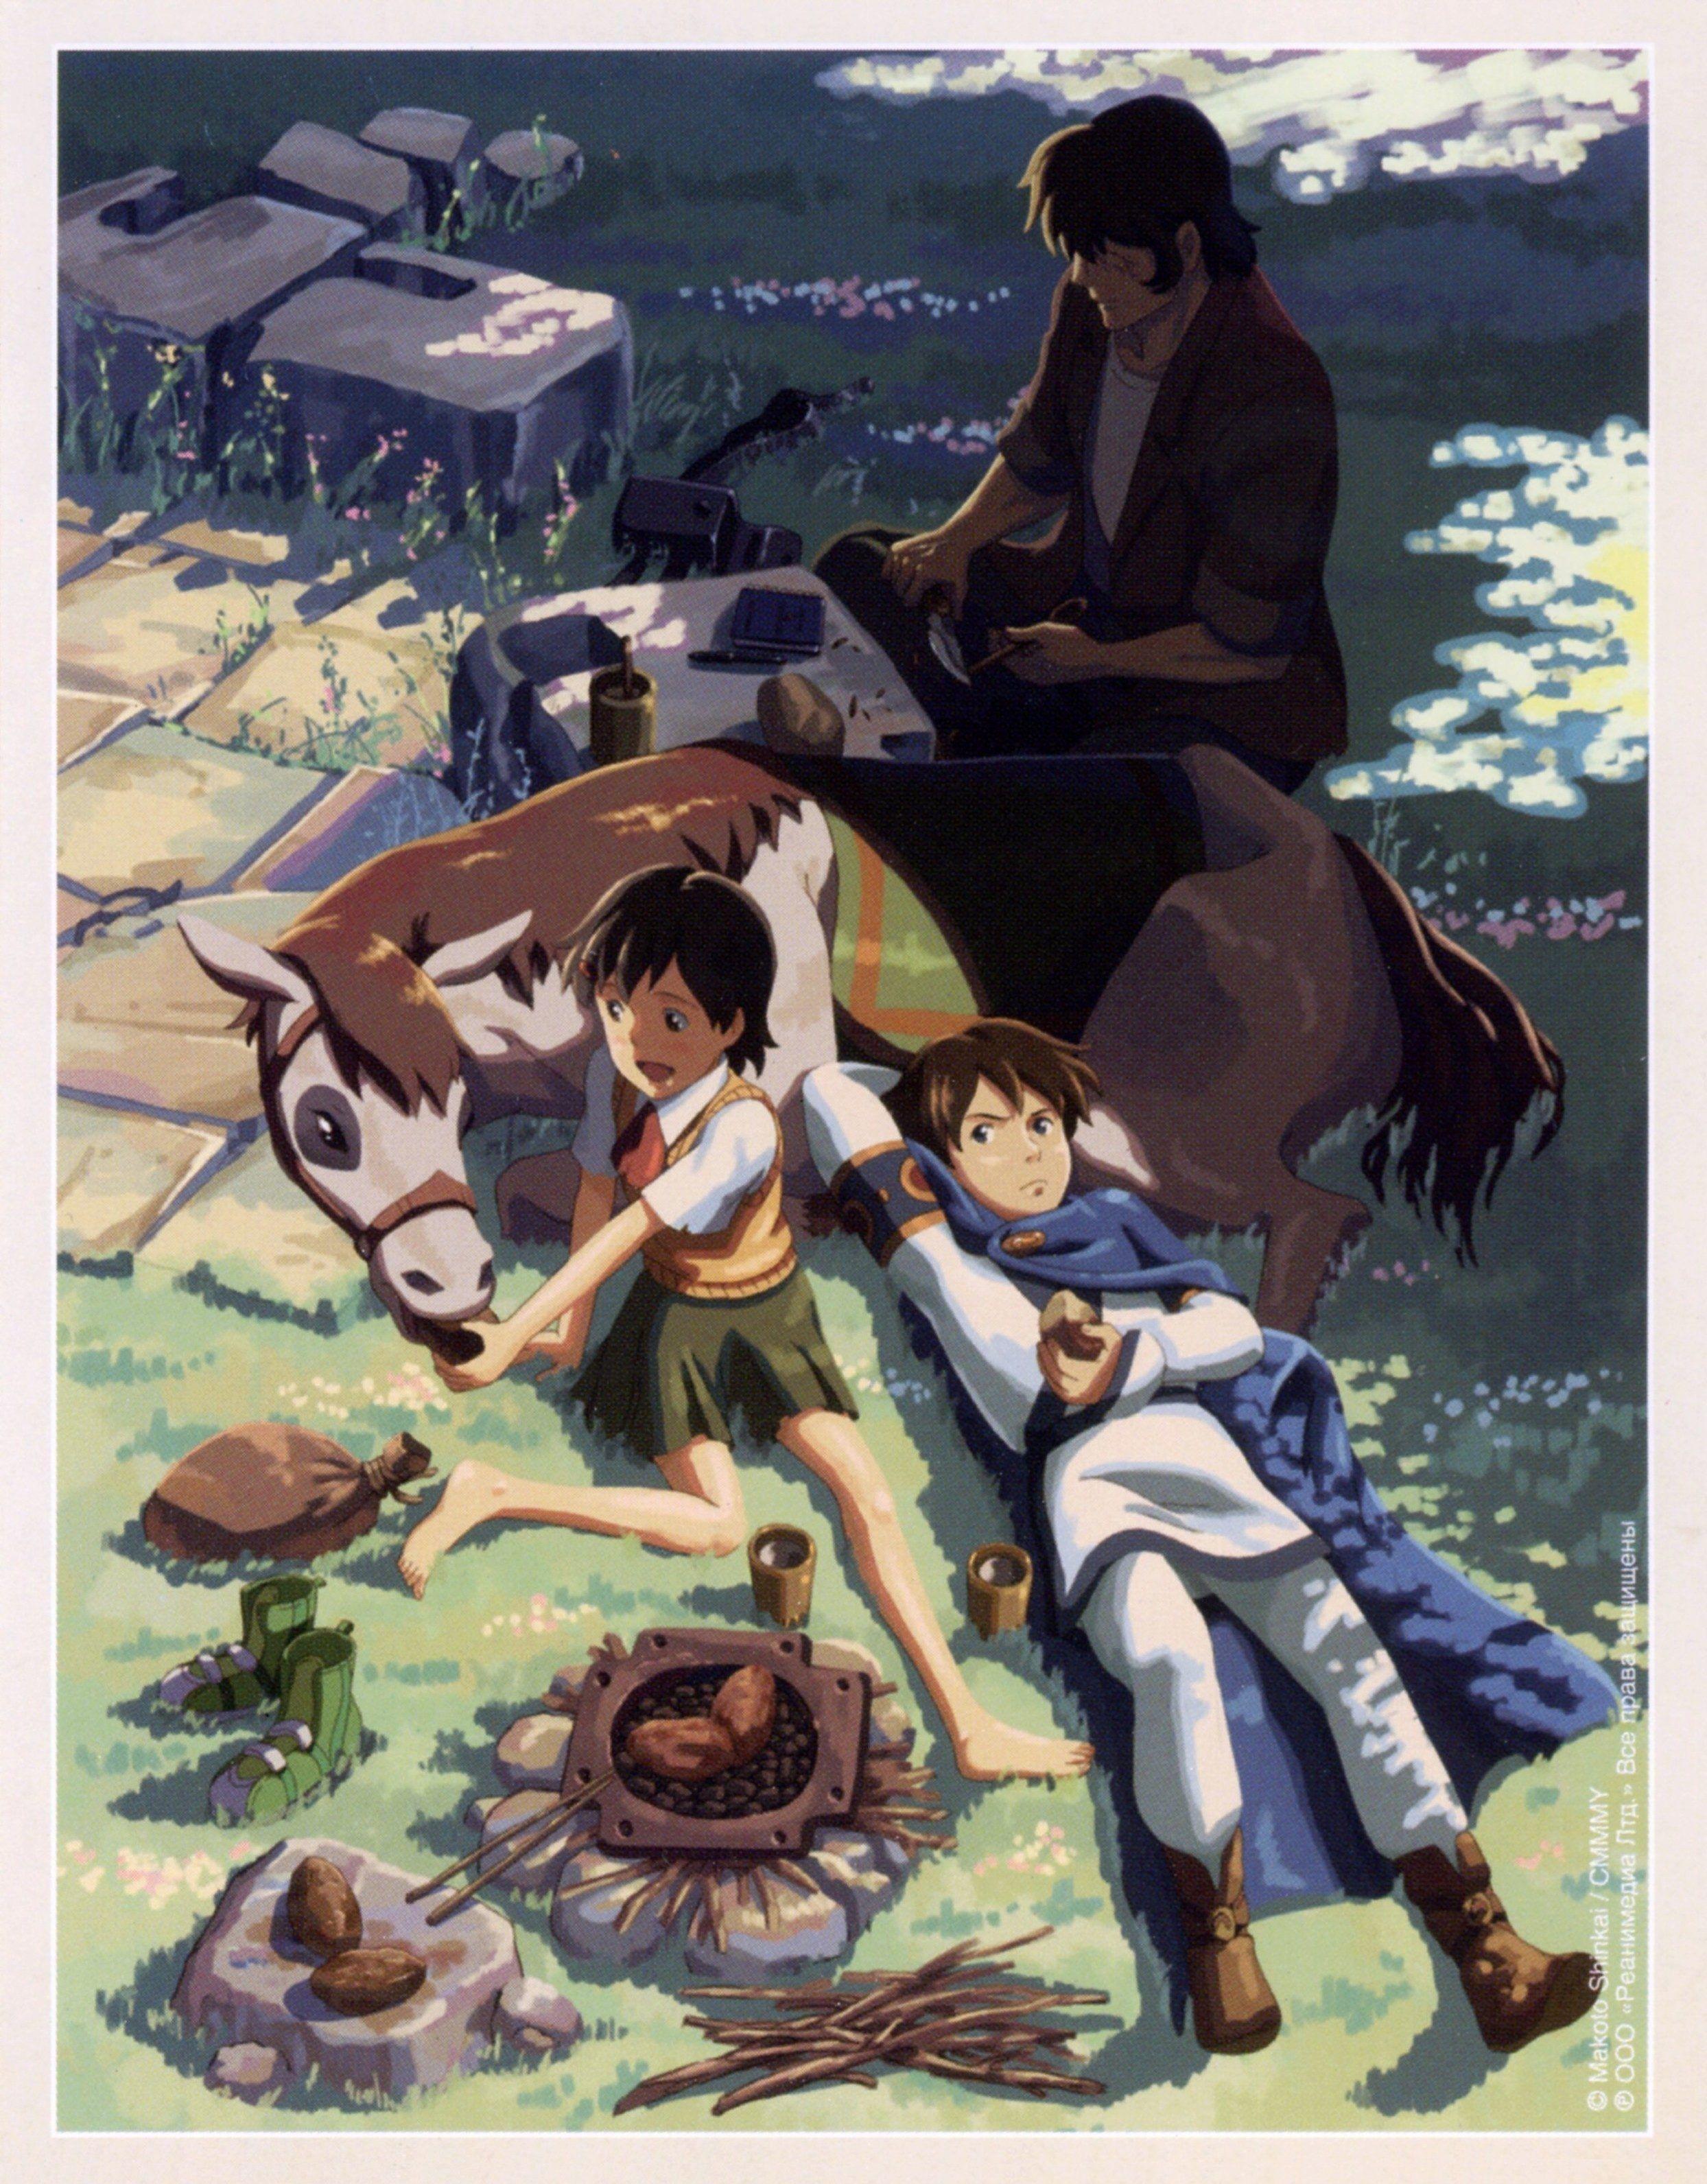 Directed by Makoto Shinkai. With Ryûnosuke Kamiki, Mone